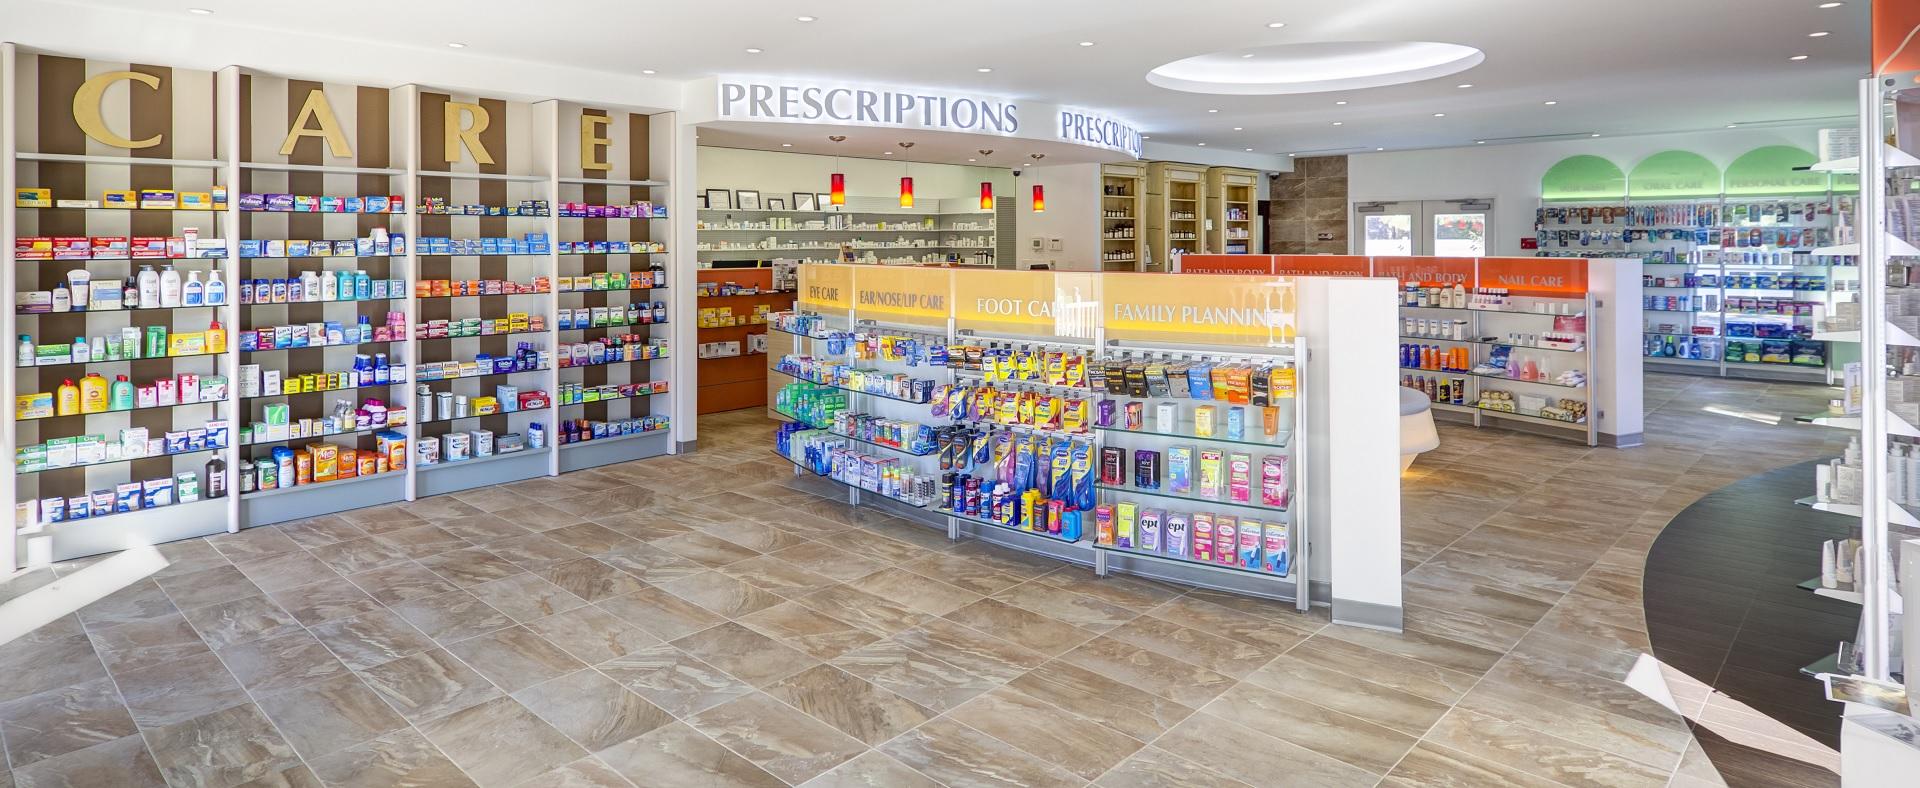 Compounding Pharmacy Monmouth County Nj